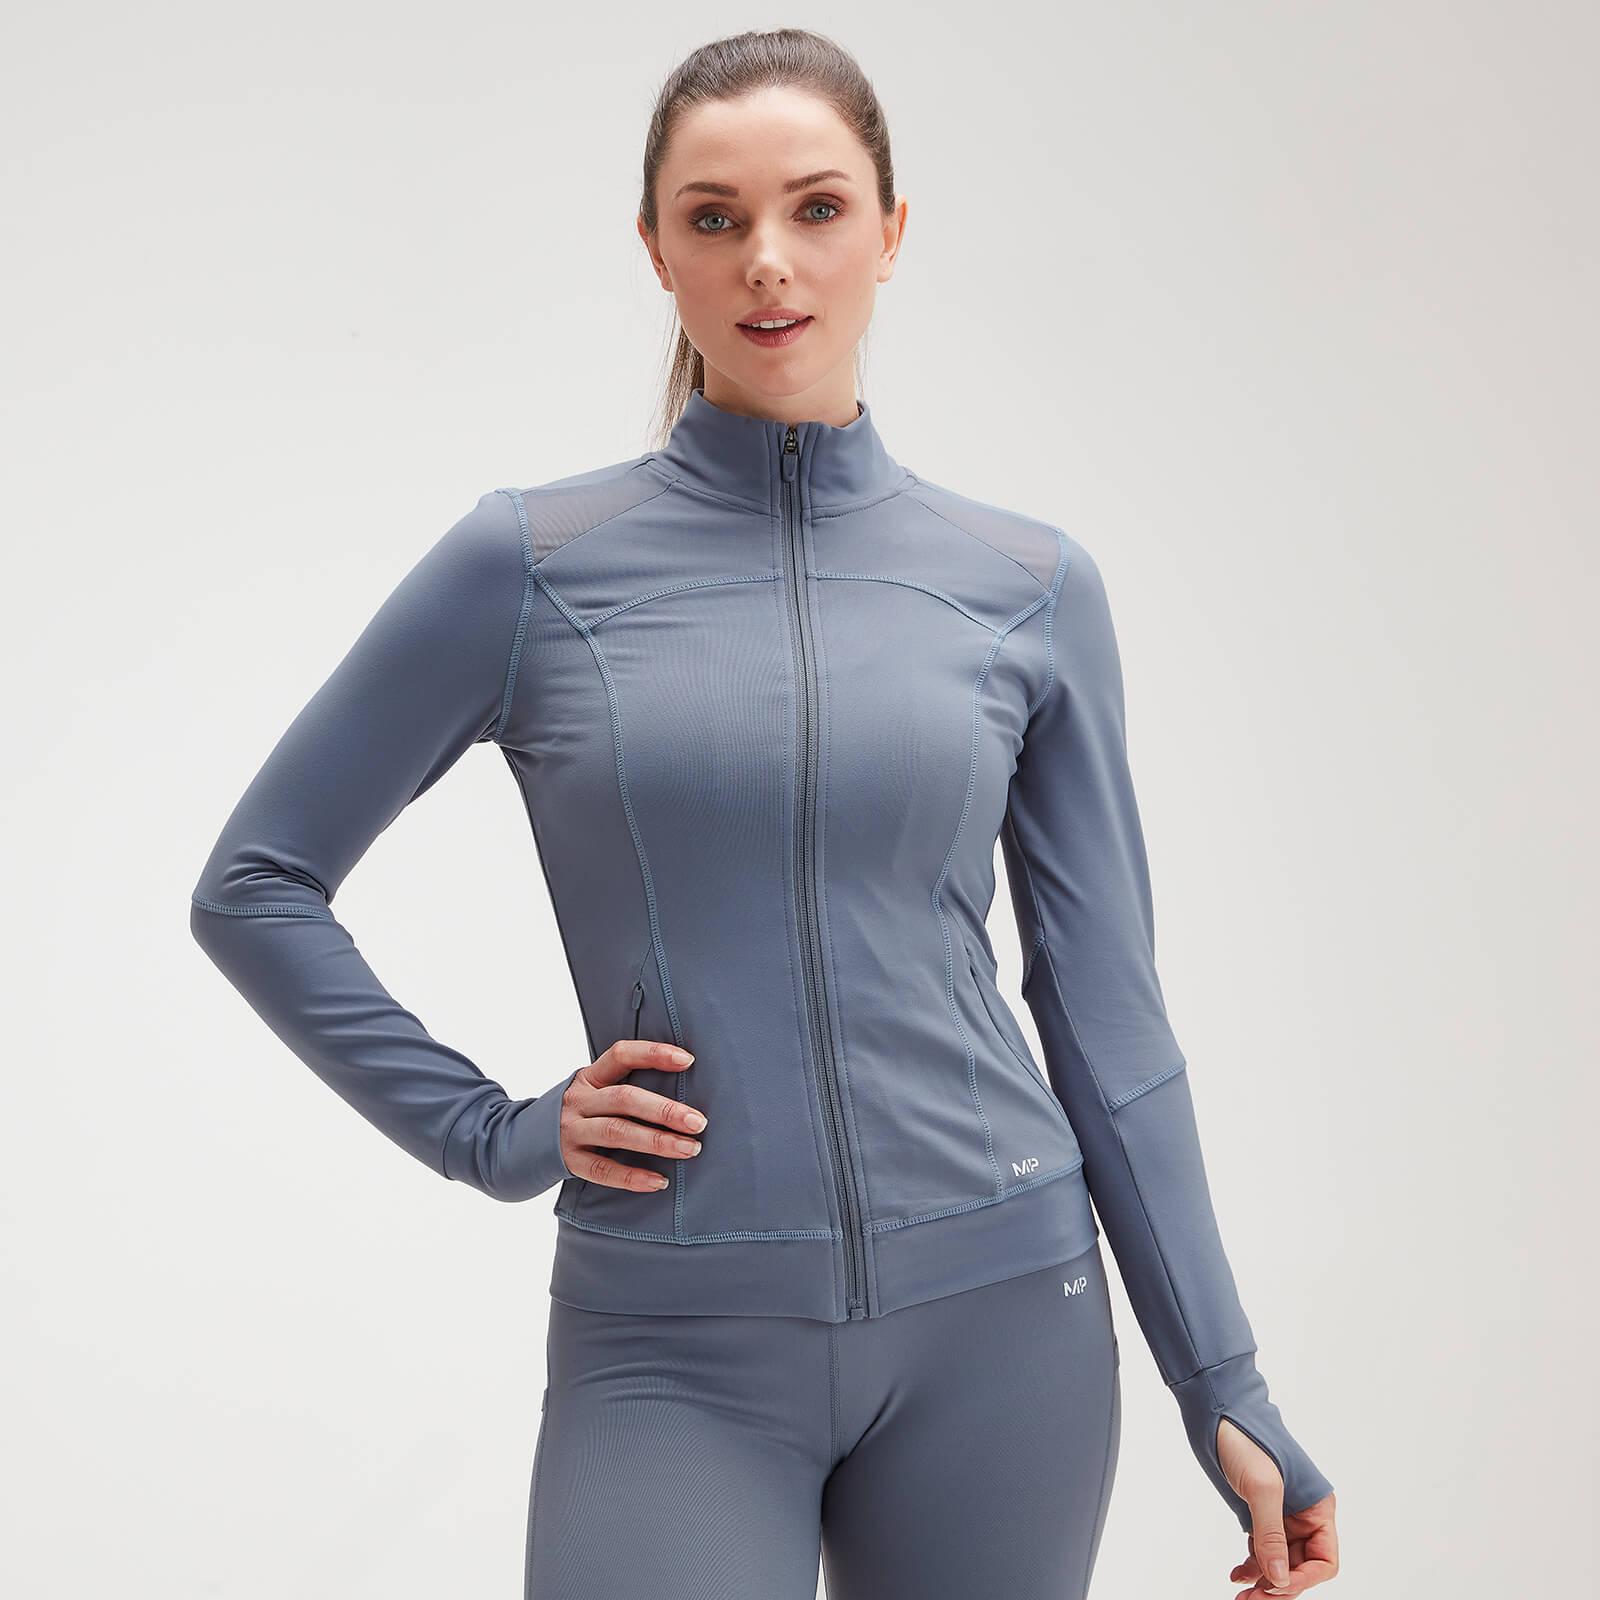 Купить MP Women's Power Jacket - Galaxy - XXS, Myprotein International